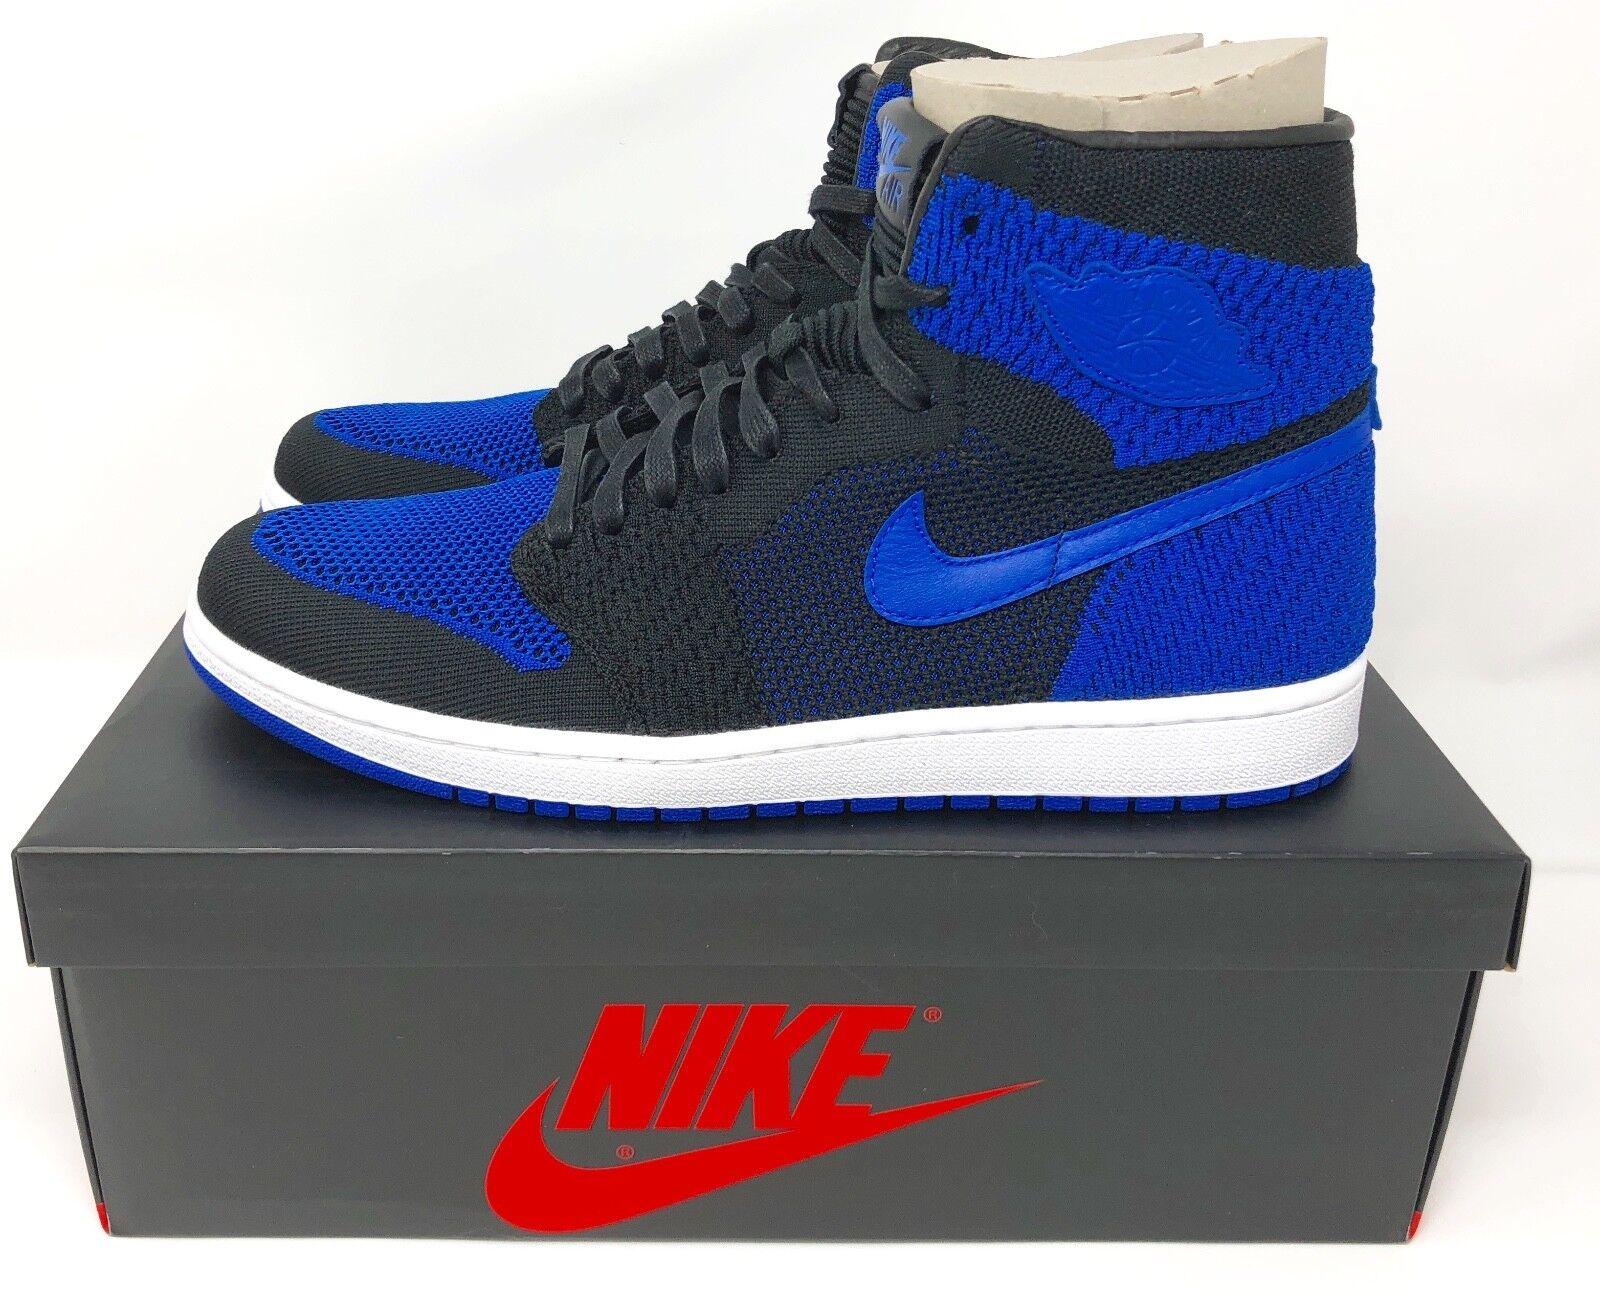 NIKE Air Jordan 1 Retro High Flyknit Shoes Blue Royal/Black 919704 006 Comfortable Cheap women's shoes women's shoes